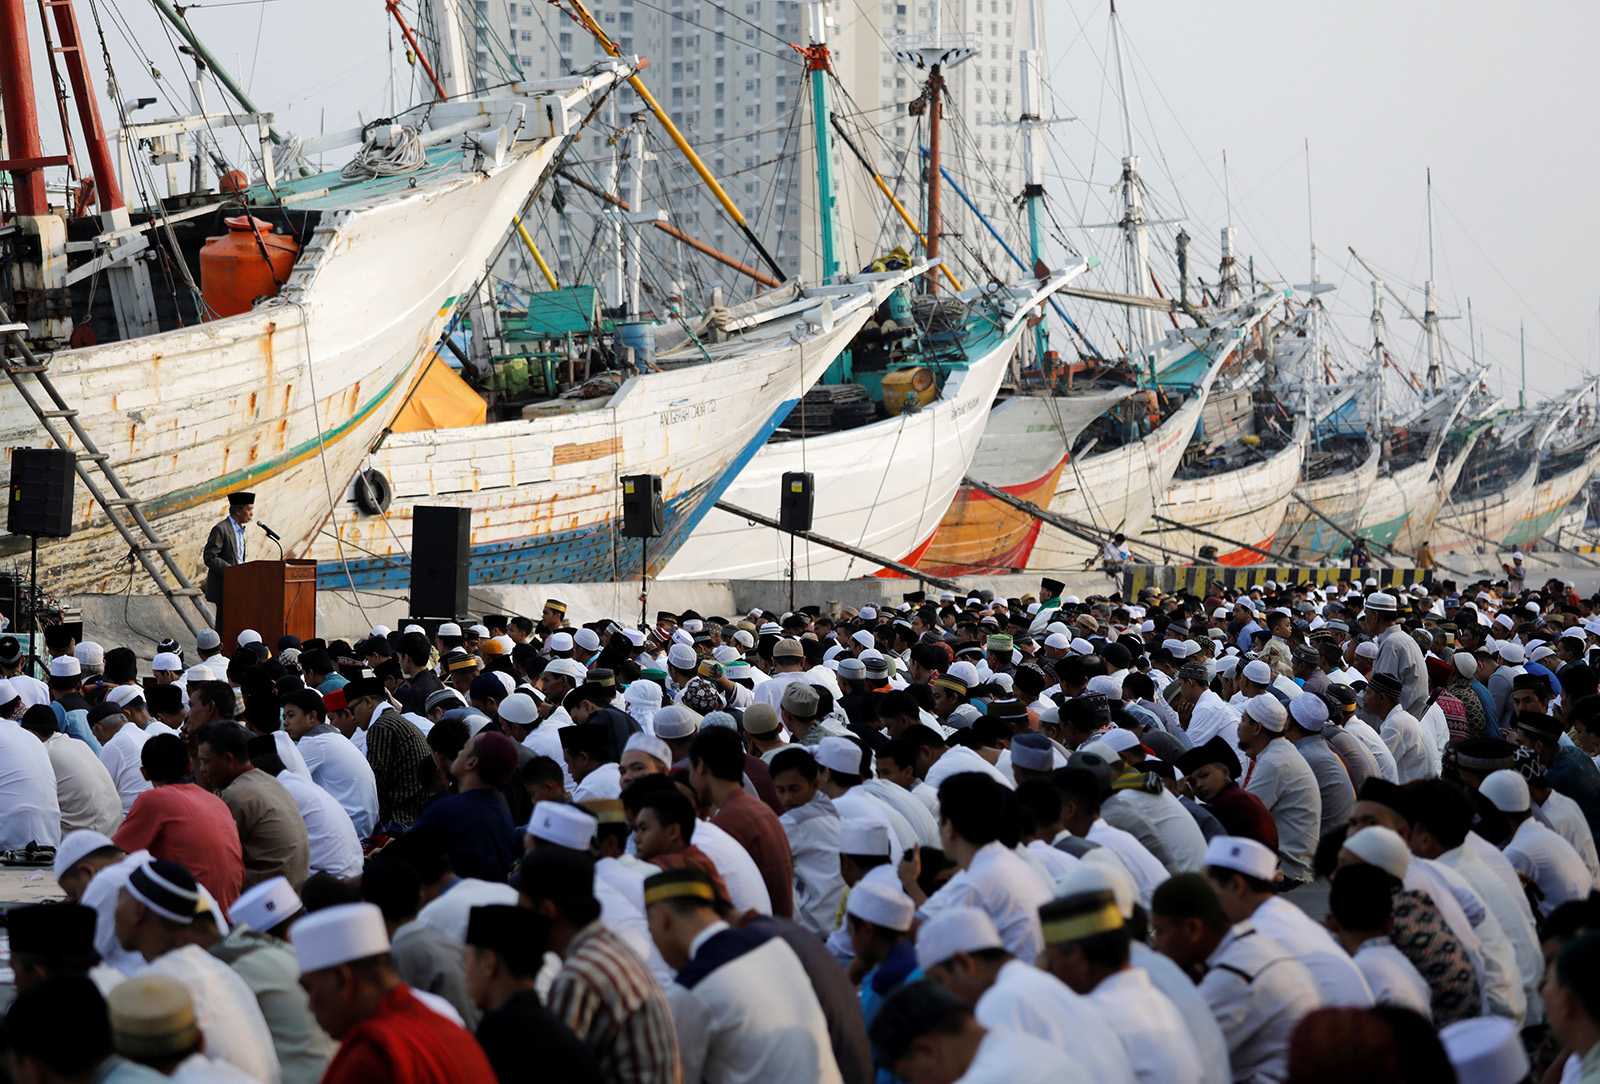 Muslims attend prayers to celebrate Eid al-Fitr, marking the end of the holy fasting month of Ramadan, at Sunda Kelapa port in Jakarta